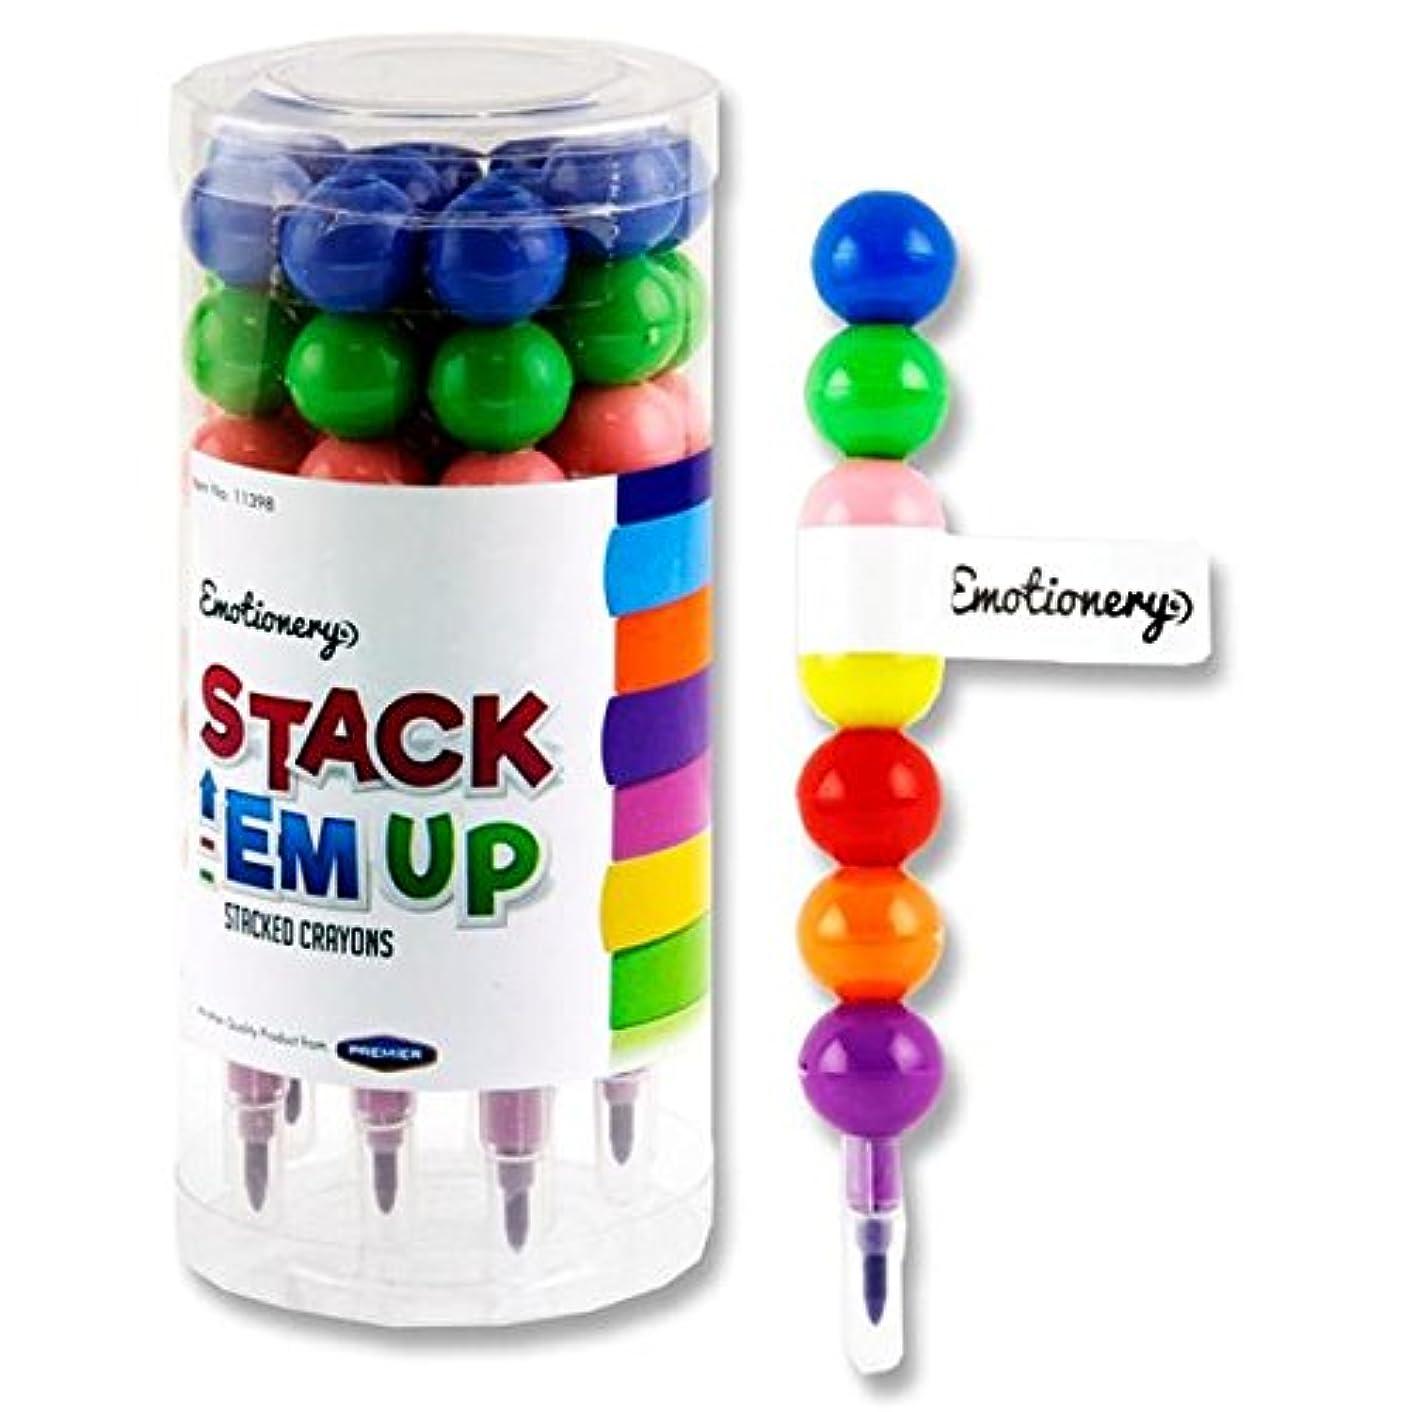 Premier Stationery G3811398 Emotionery Stack 'Em Up 7 Stacked Crayon (Pack of 10)